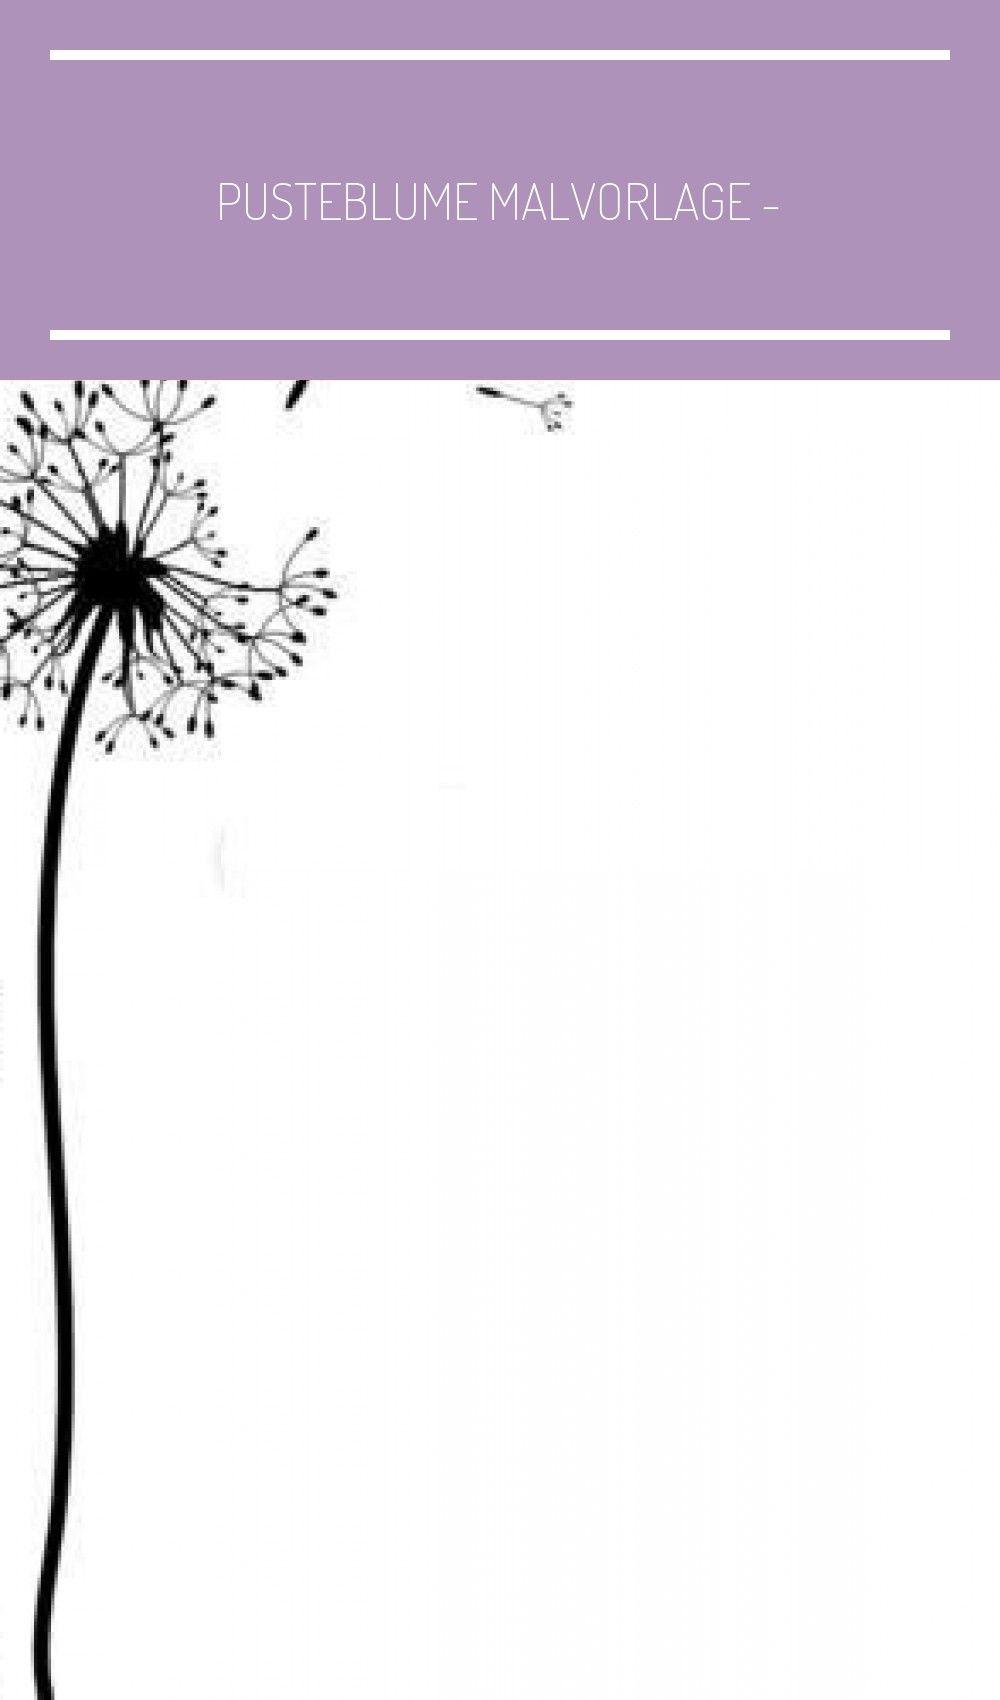 148 malvorlage pusteblume  coloring and malvorlagan